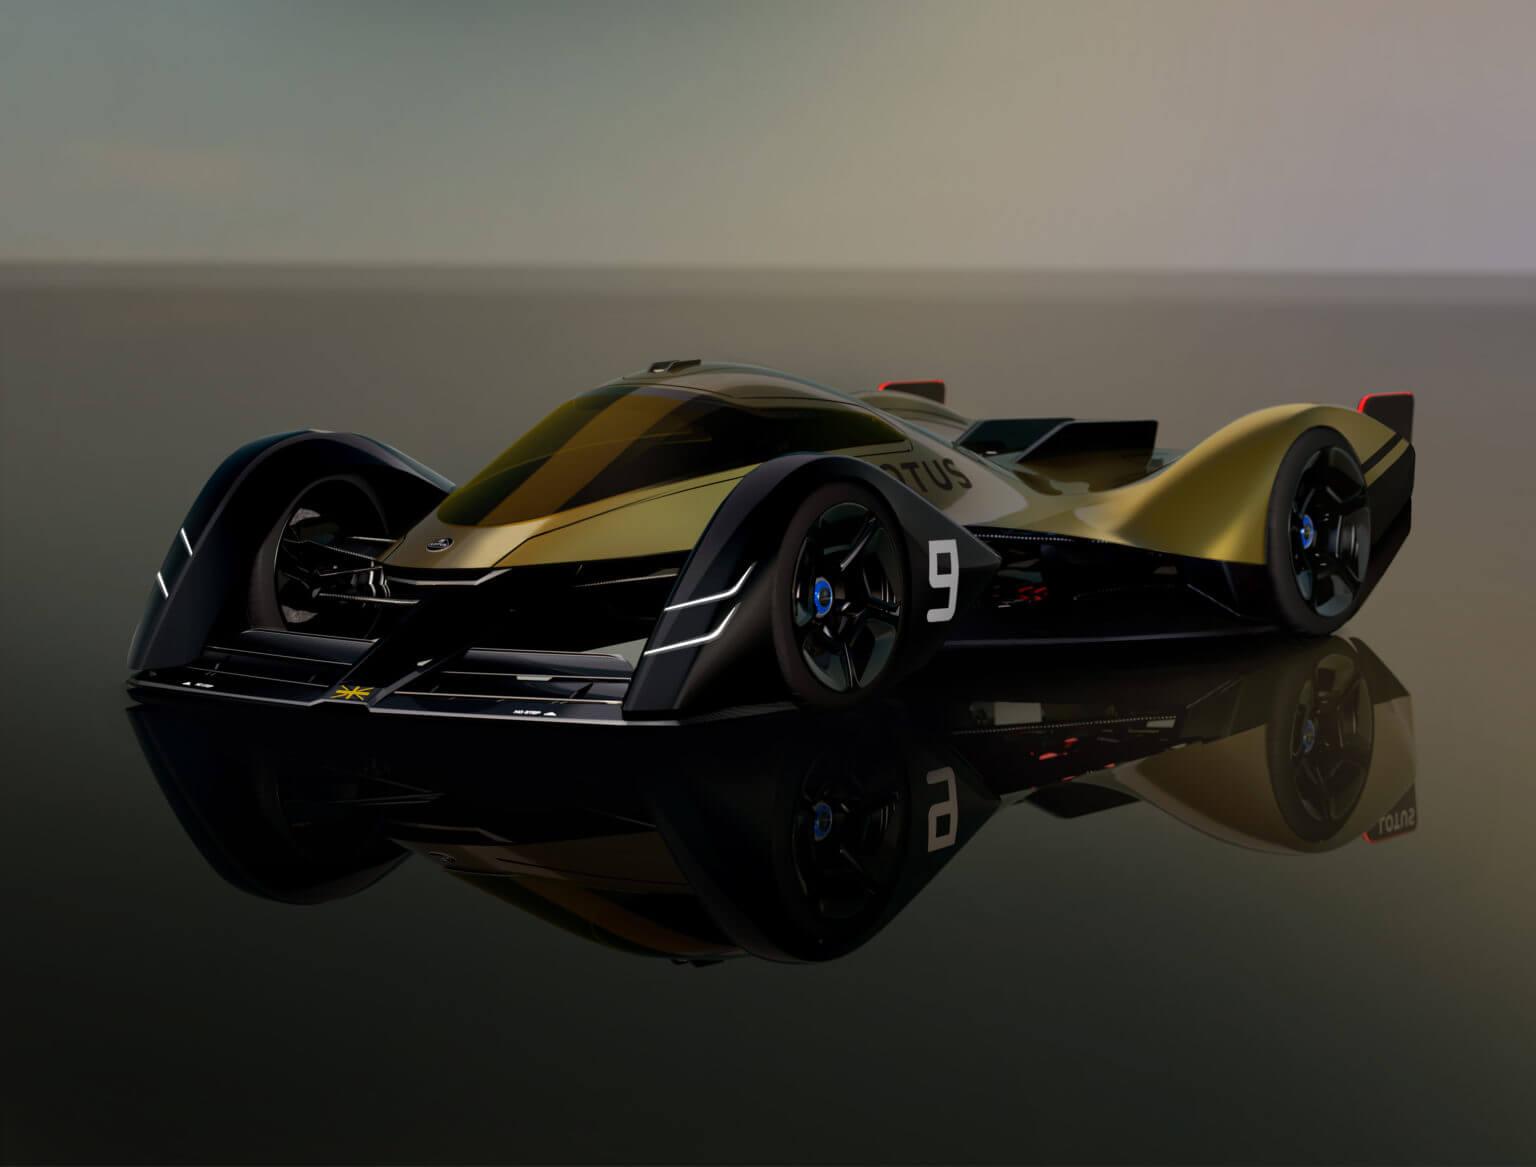 Lotus E-R9: концепт электрического гиперкара с изменяющимся кузовом